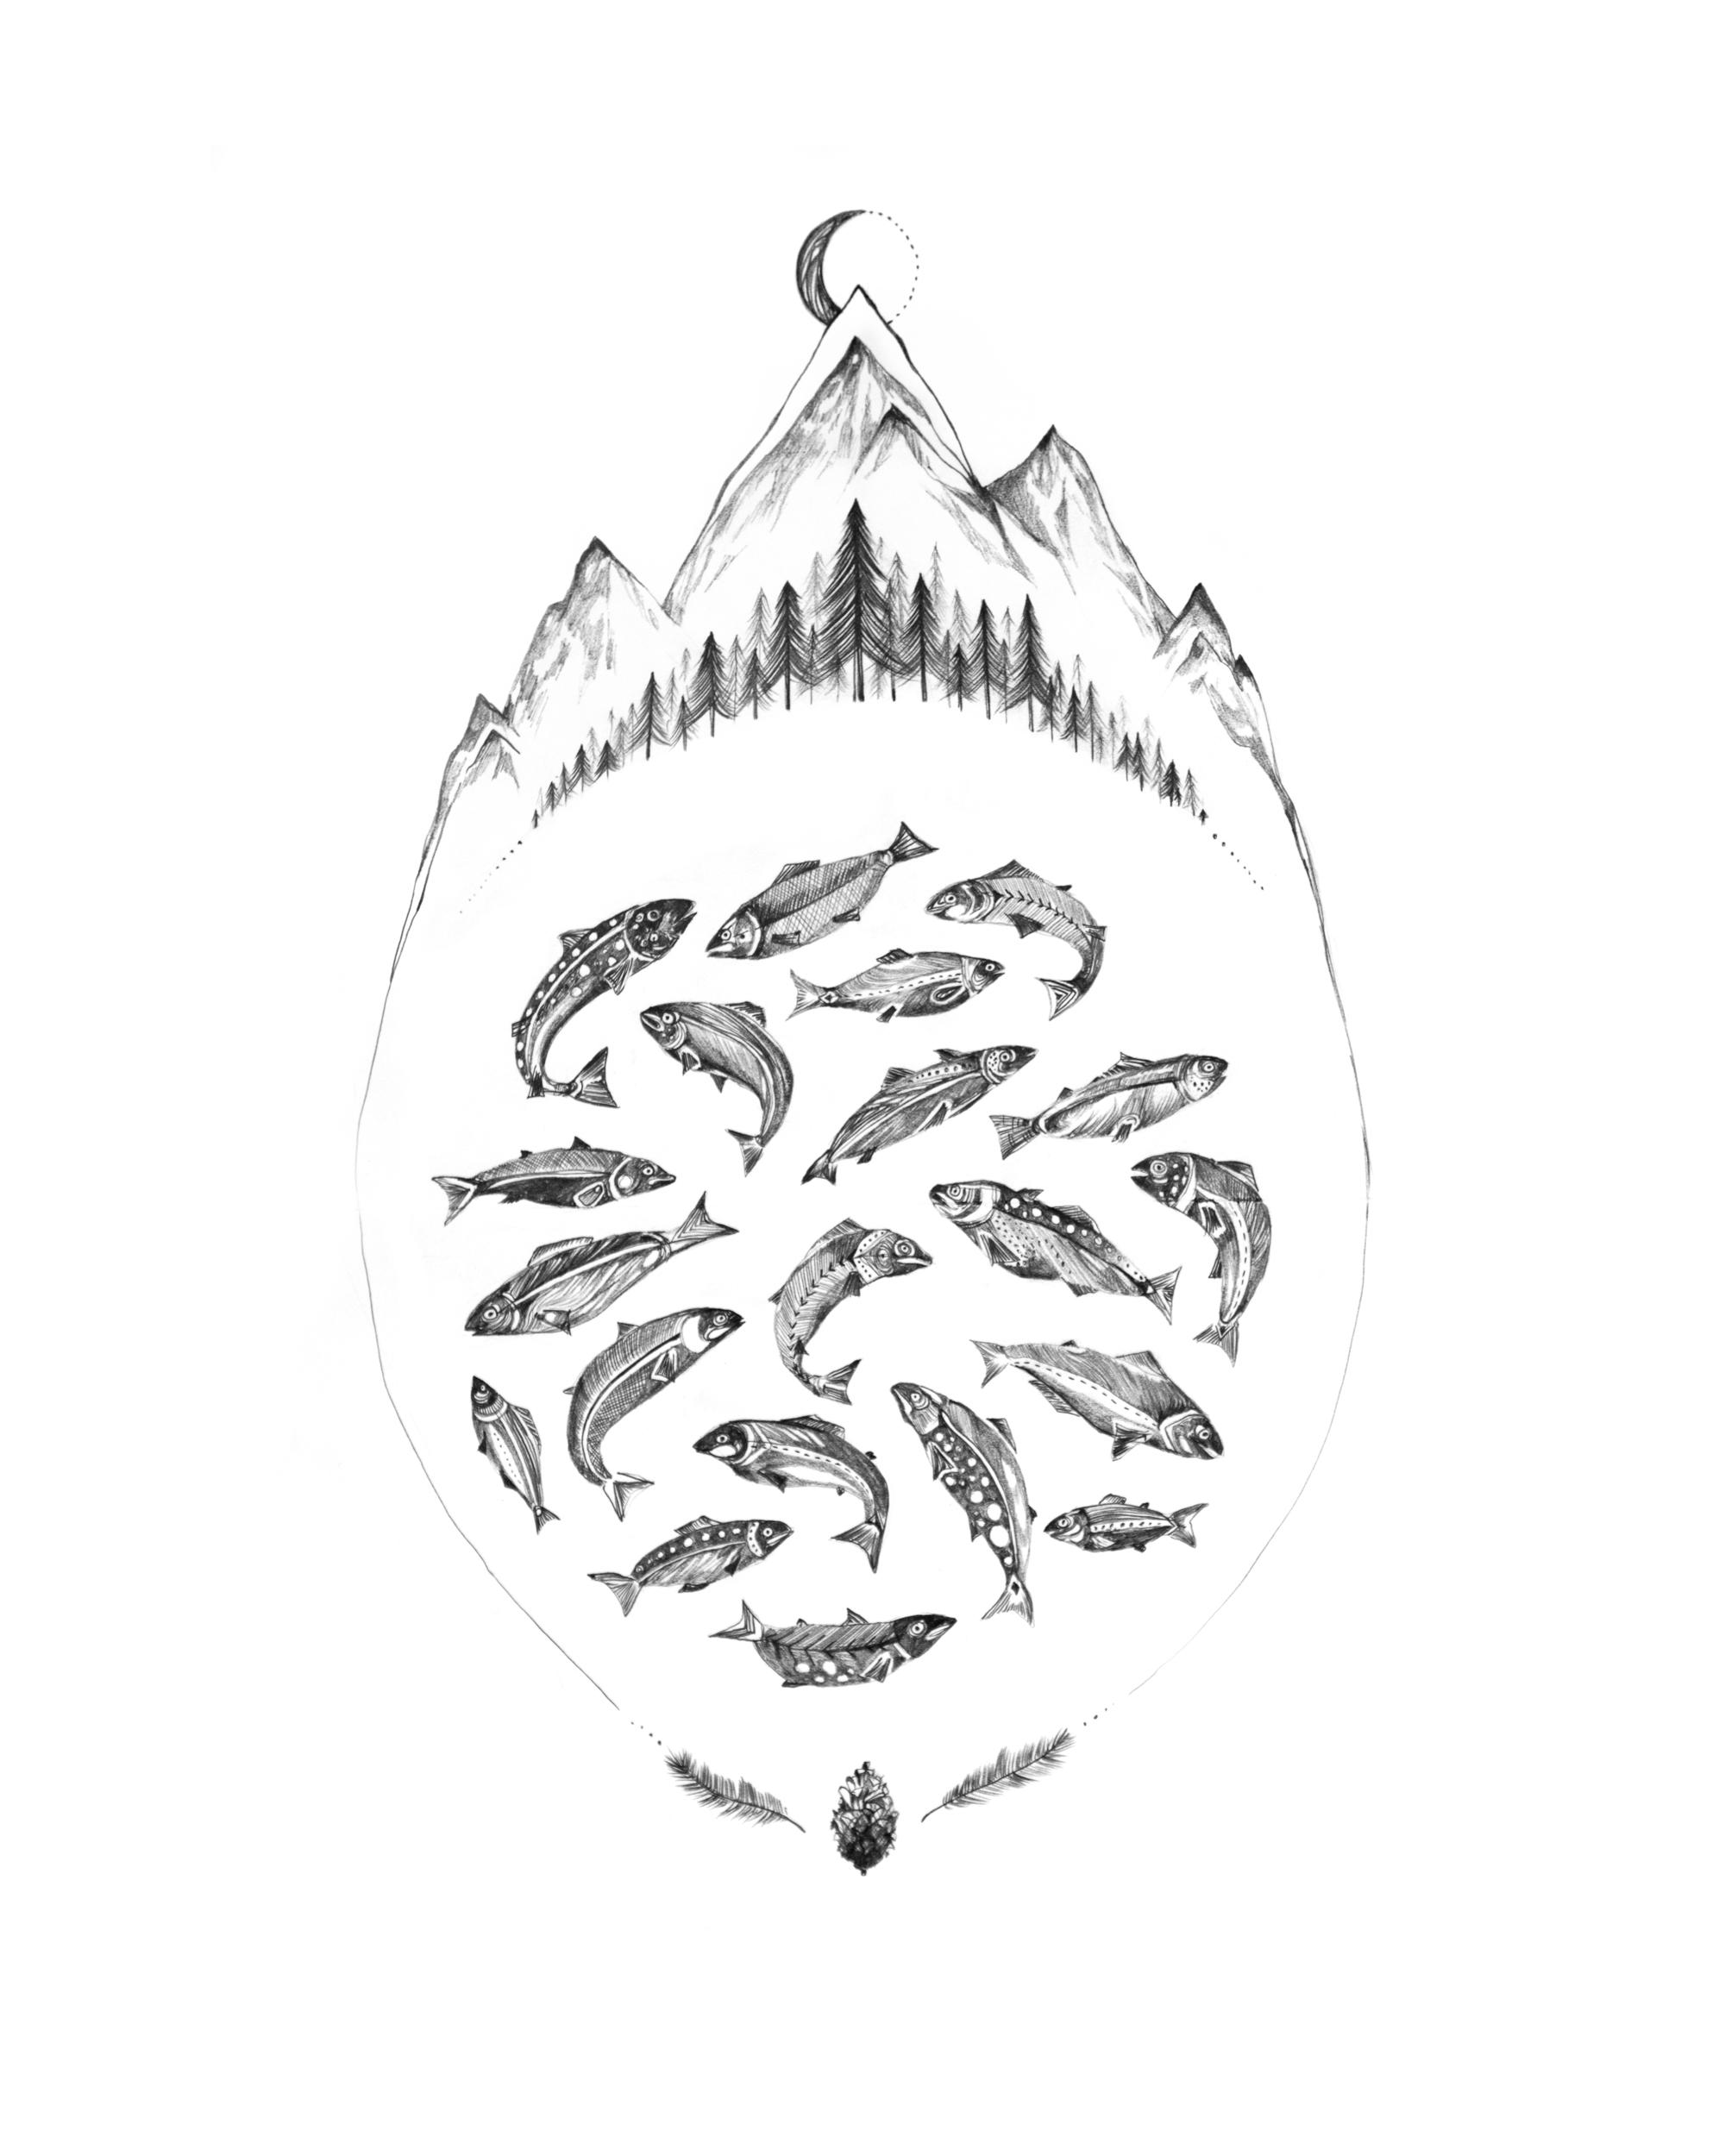 6-Bec_Kilpatrick_Illustration_PatternBecKil_RekinspireShirt2